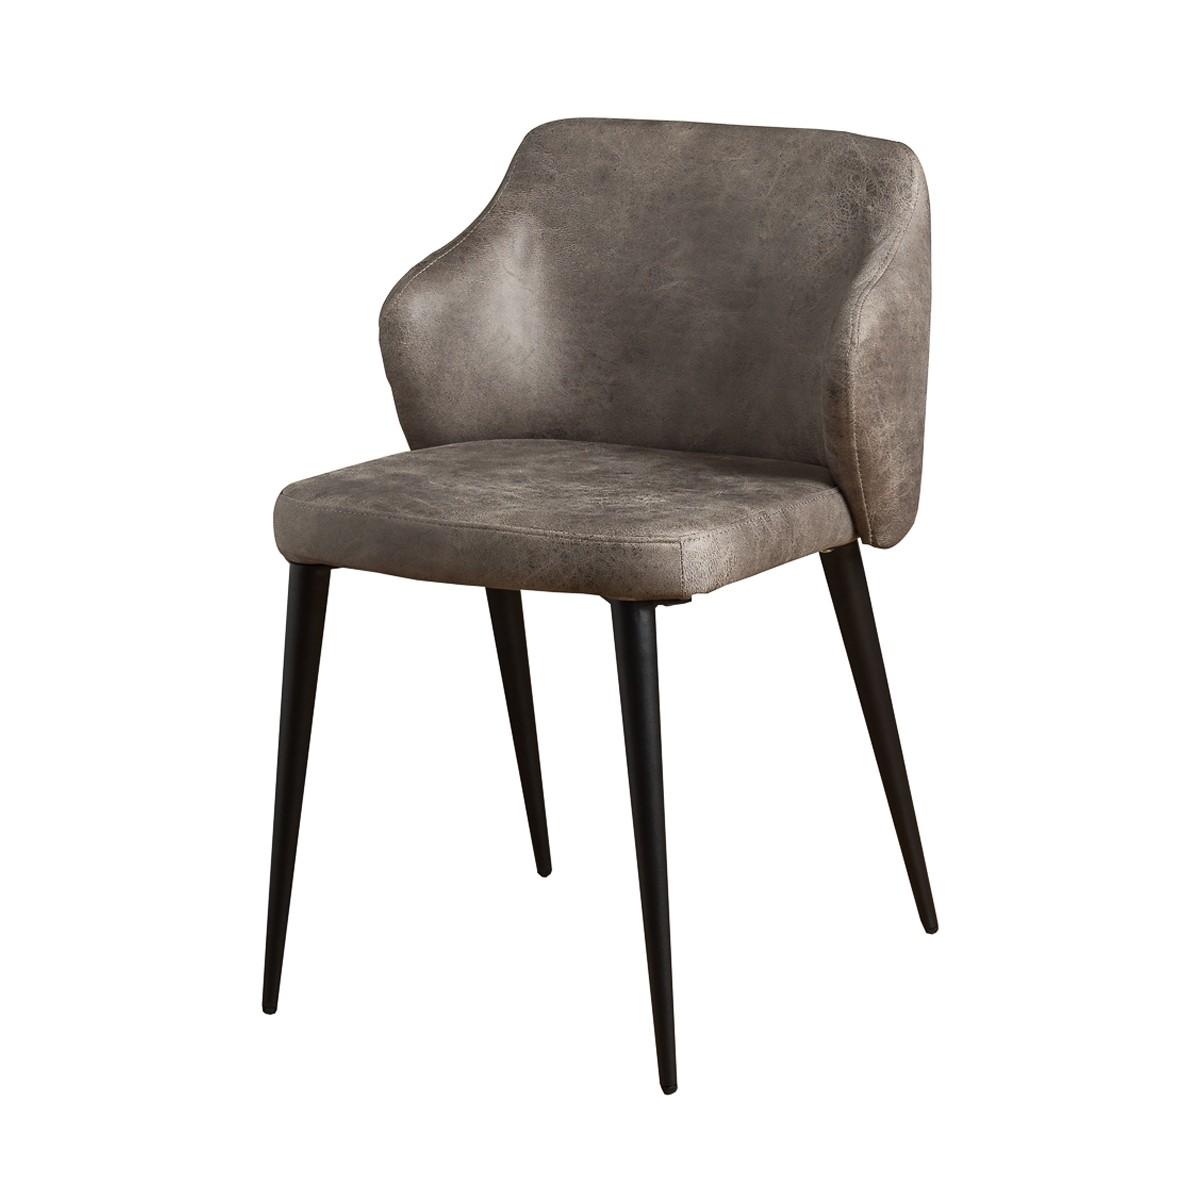 Chip - Vintage Grey Chair